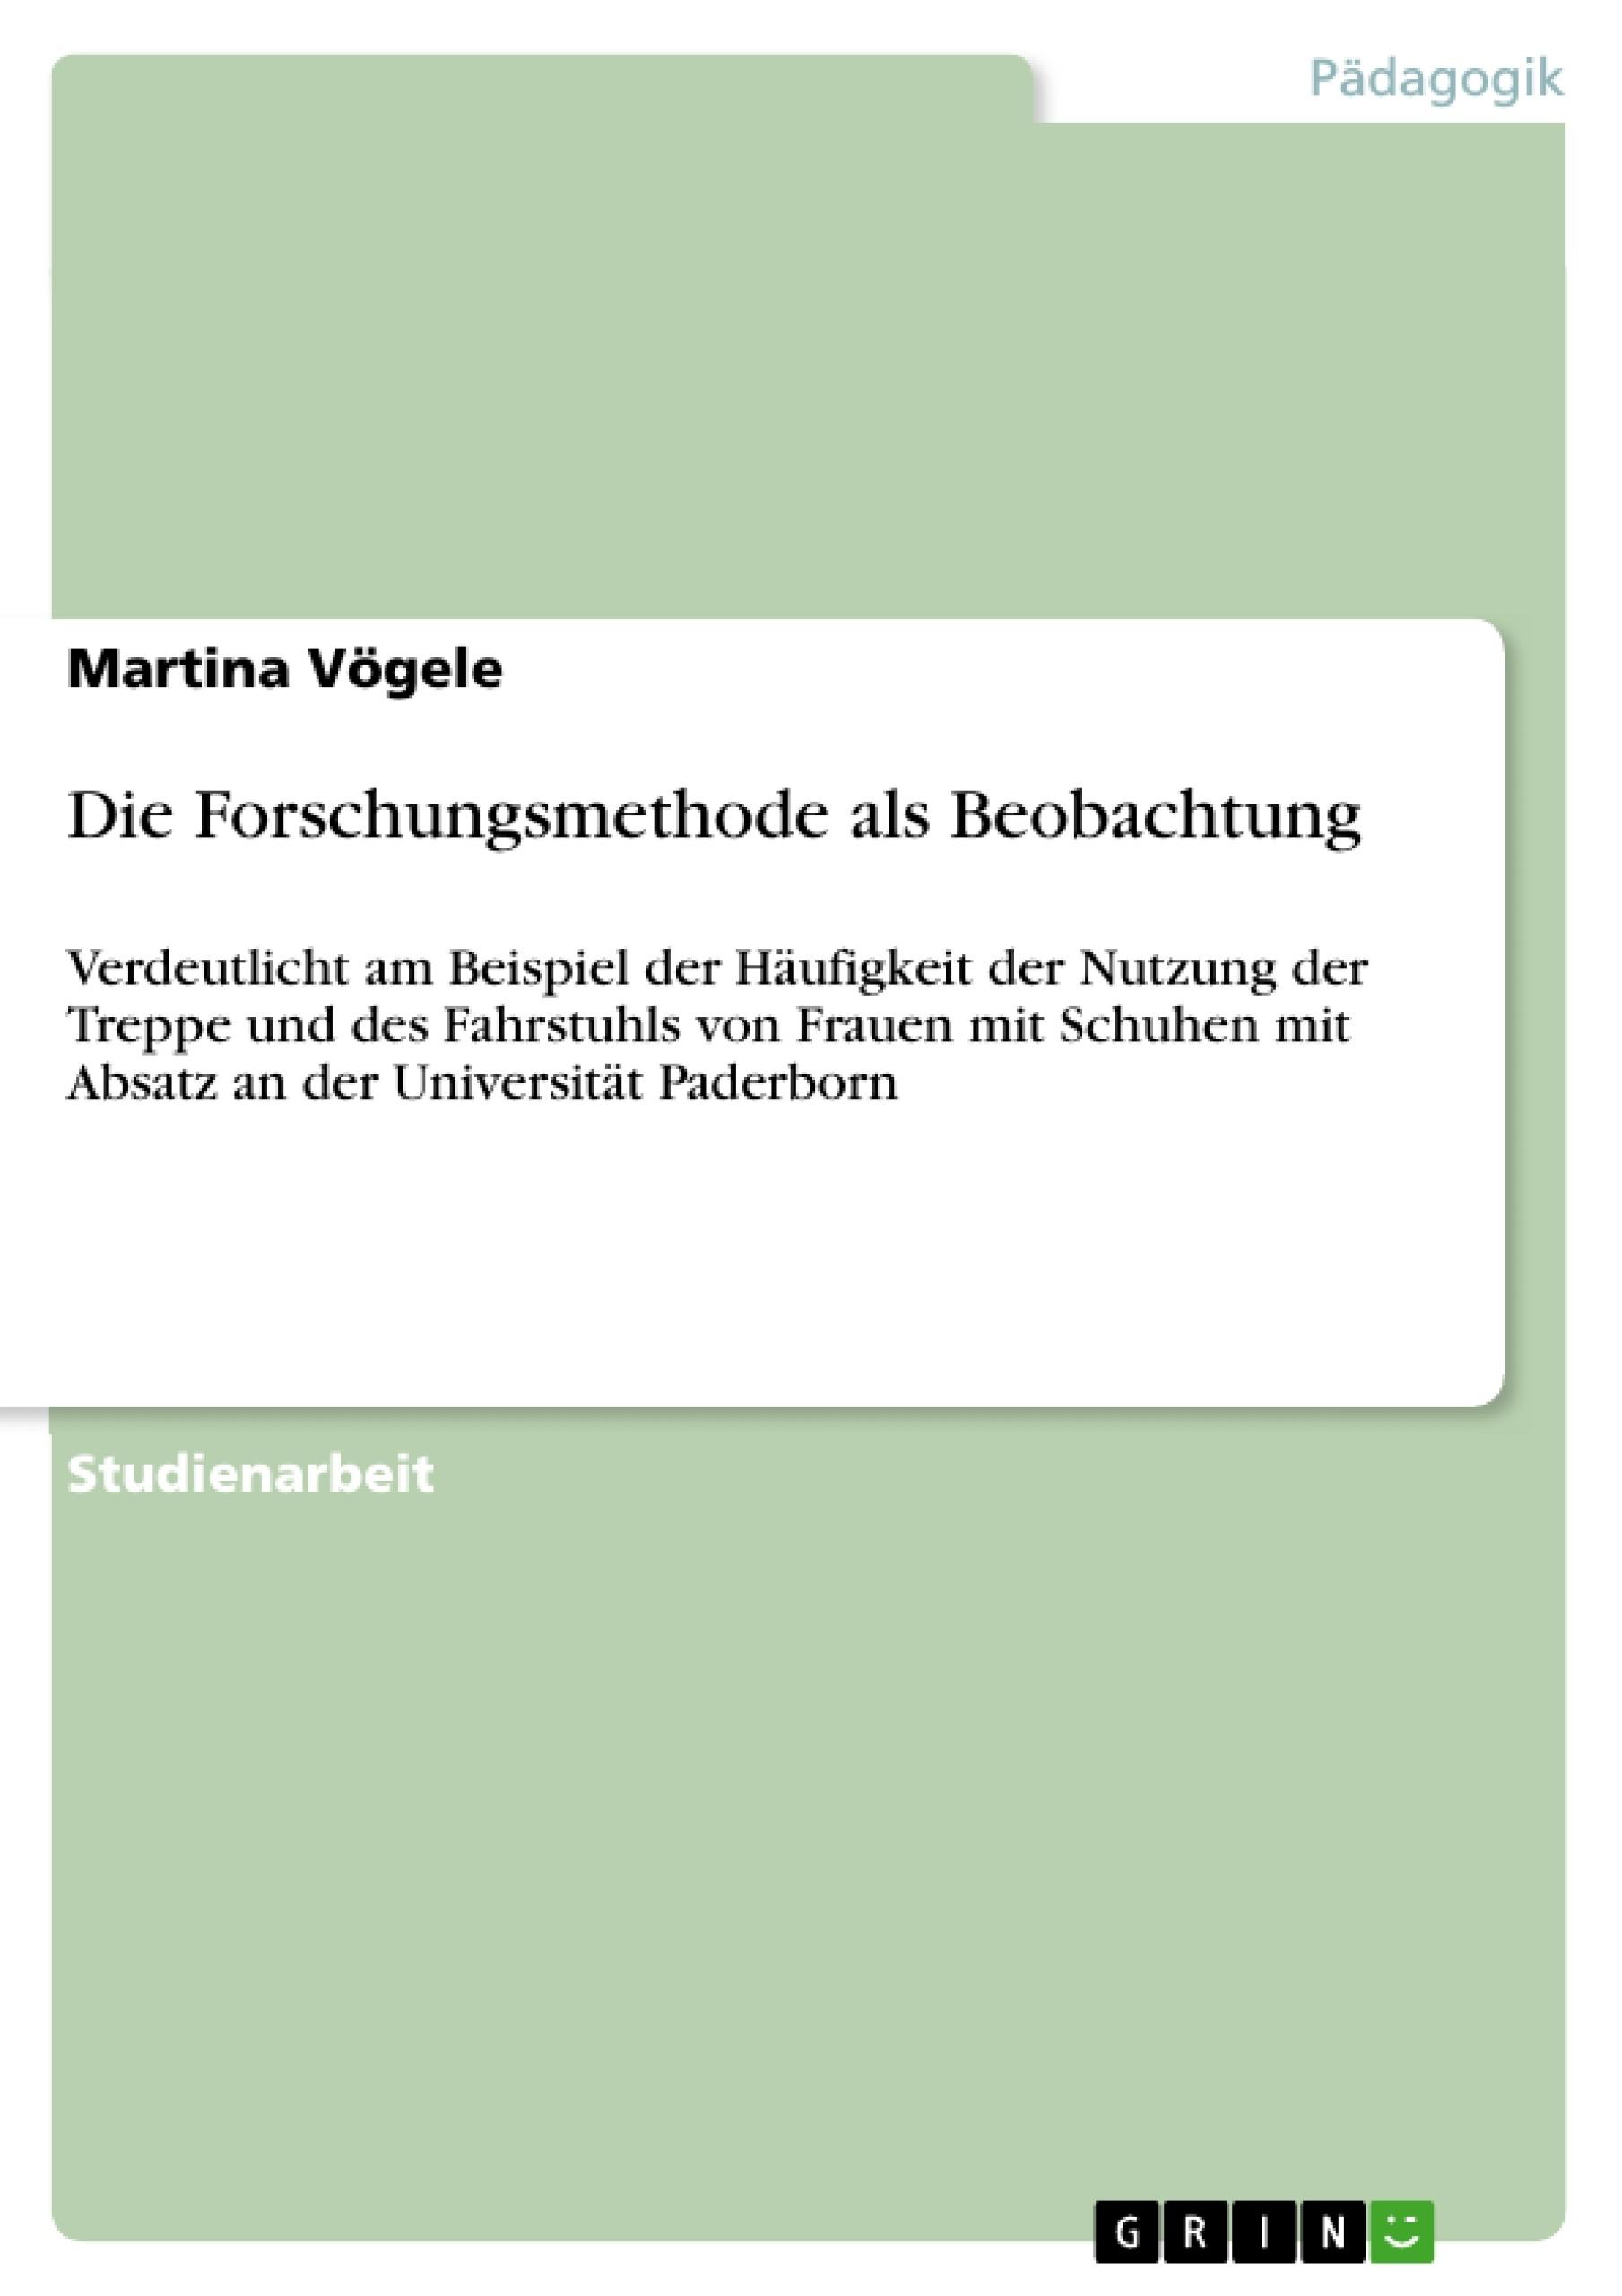 Titel: Die Forschungsmethode als Beobachtung